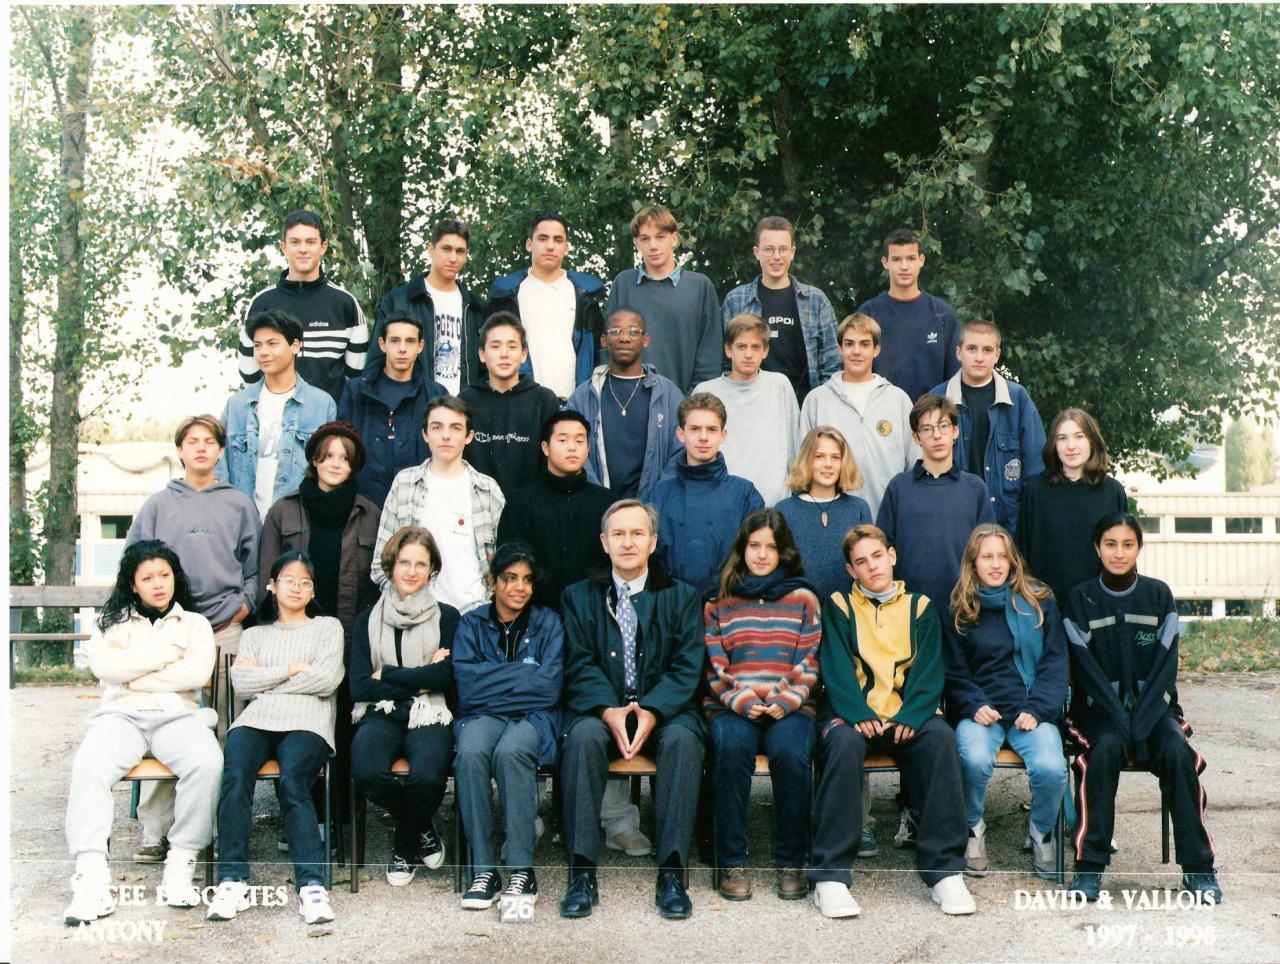 1998 - 2.6 - DAVID